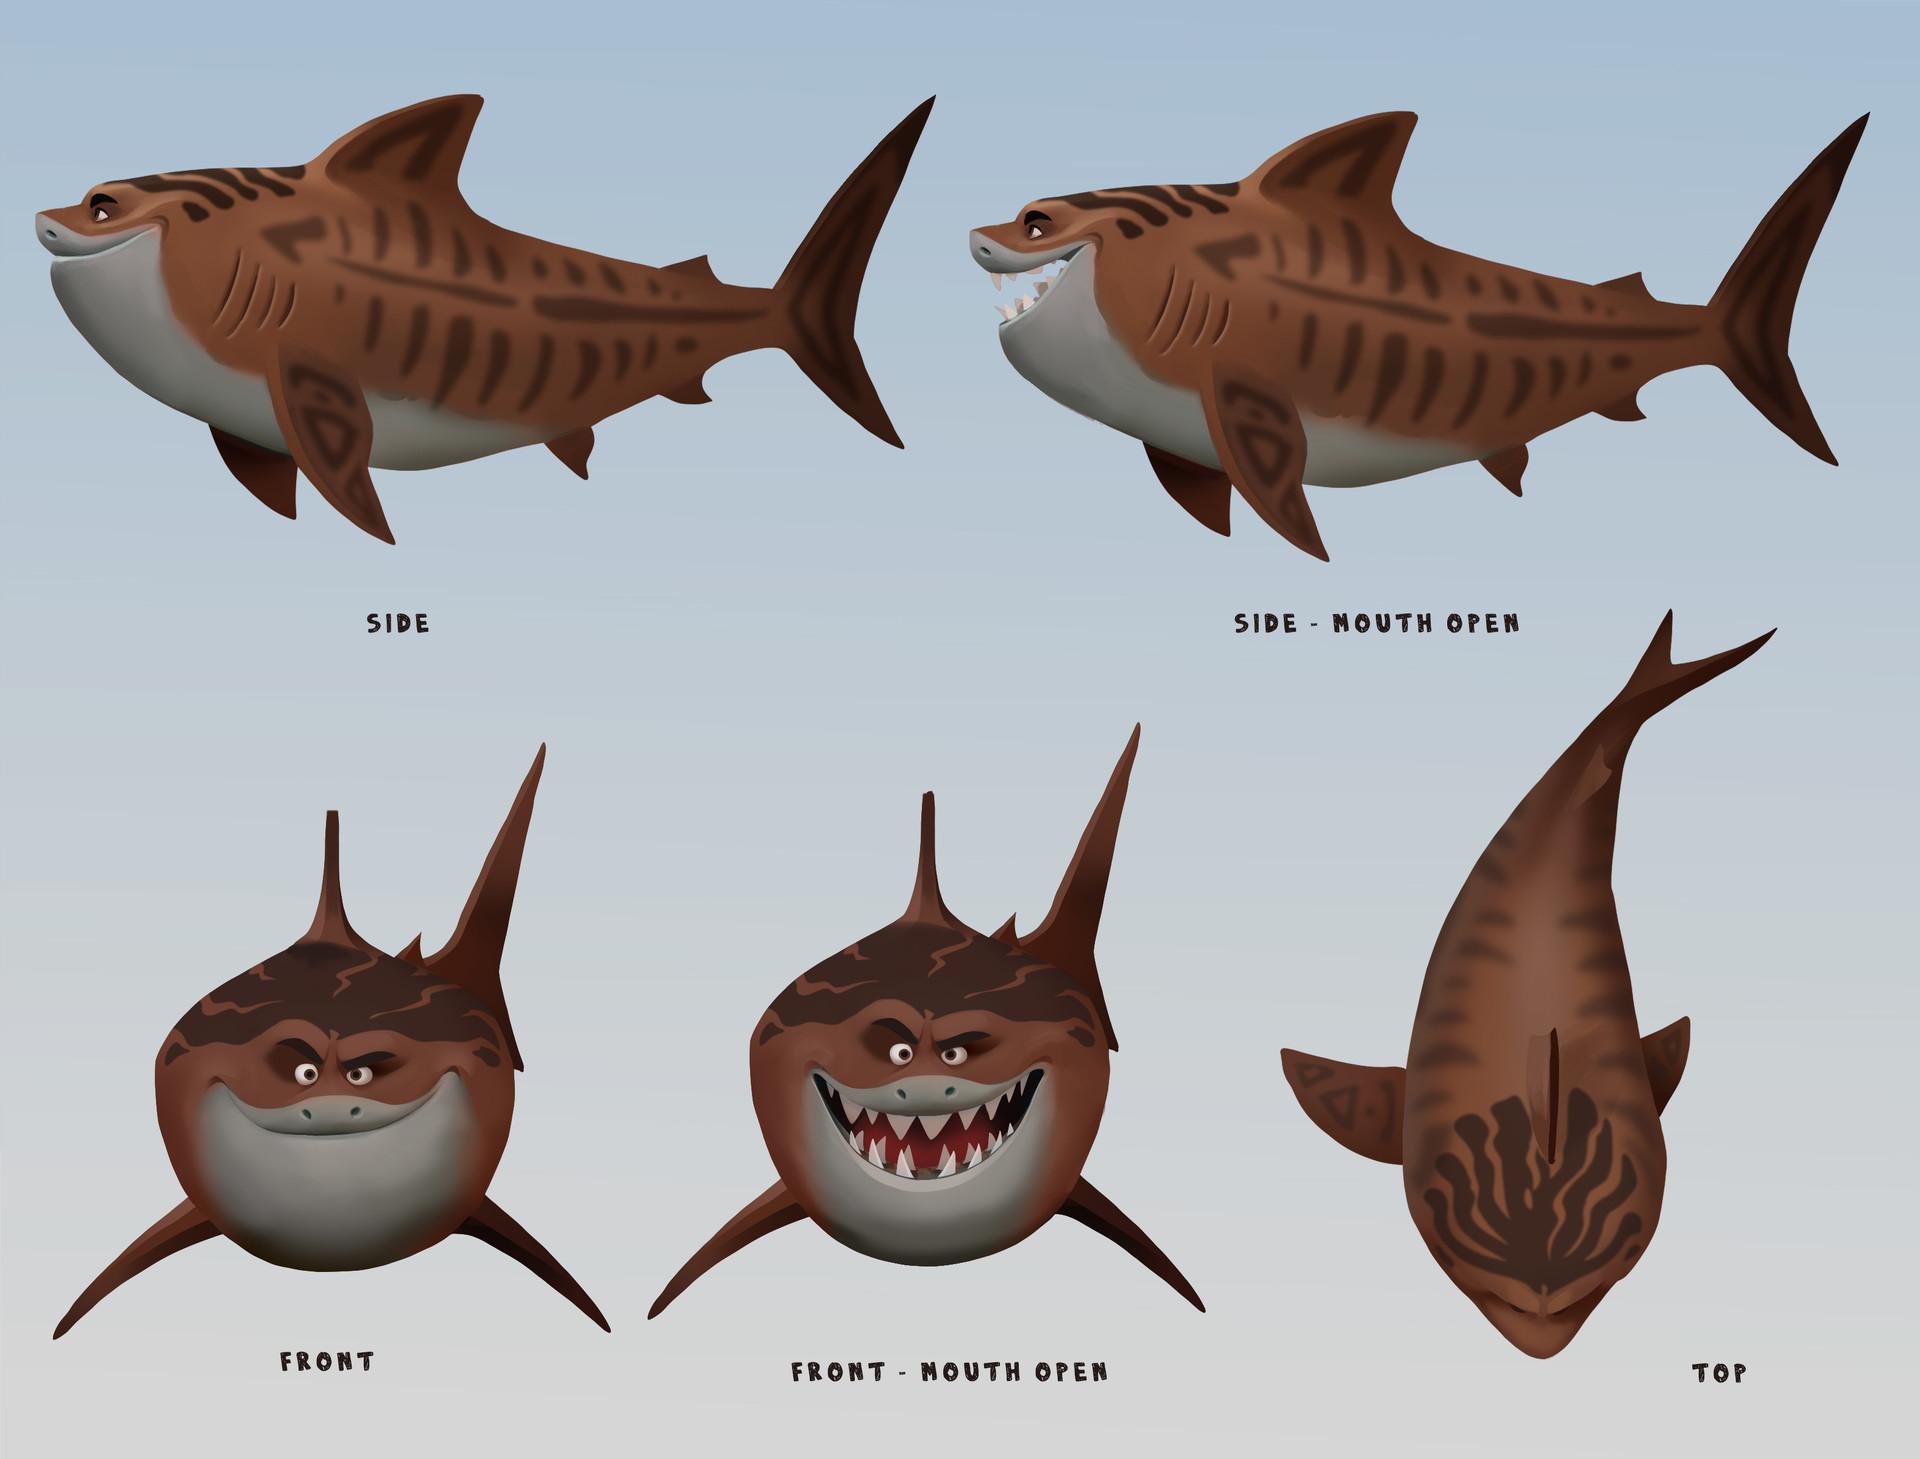 moana wildlife and animal characters jenny harder maui shark transformations based on the wda concepts